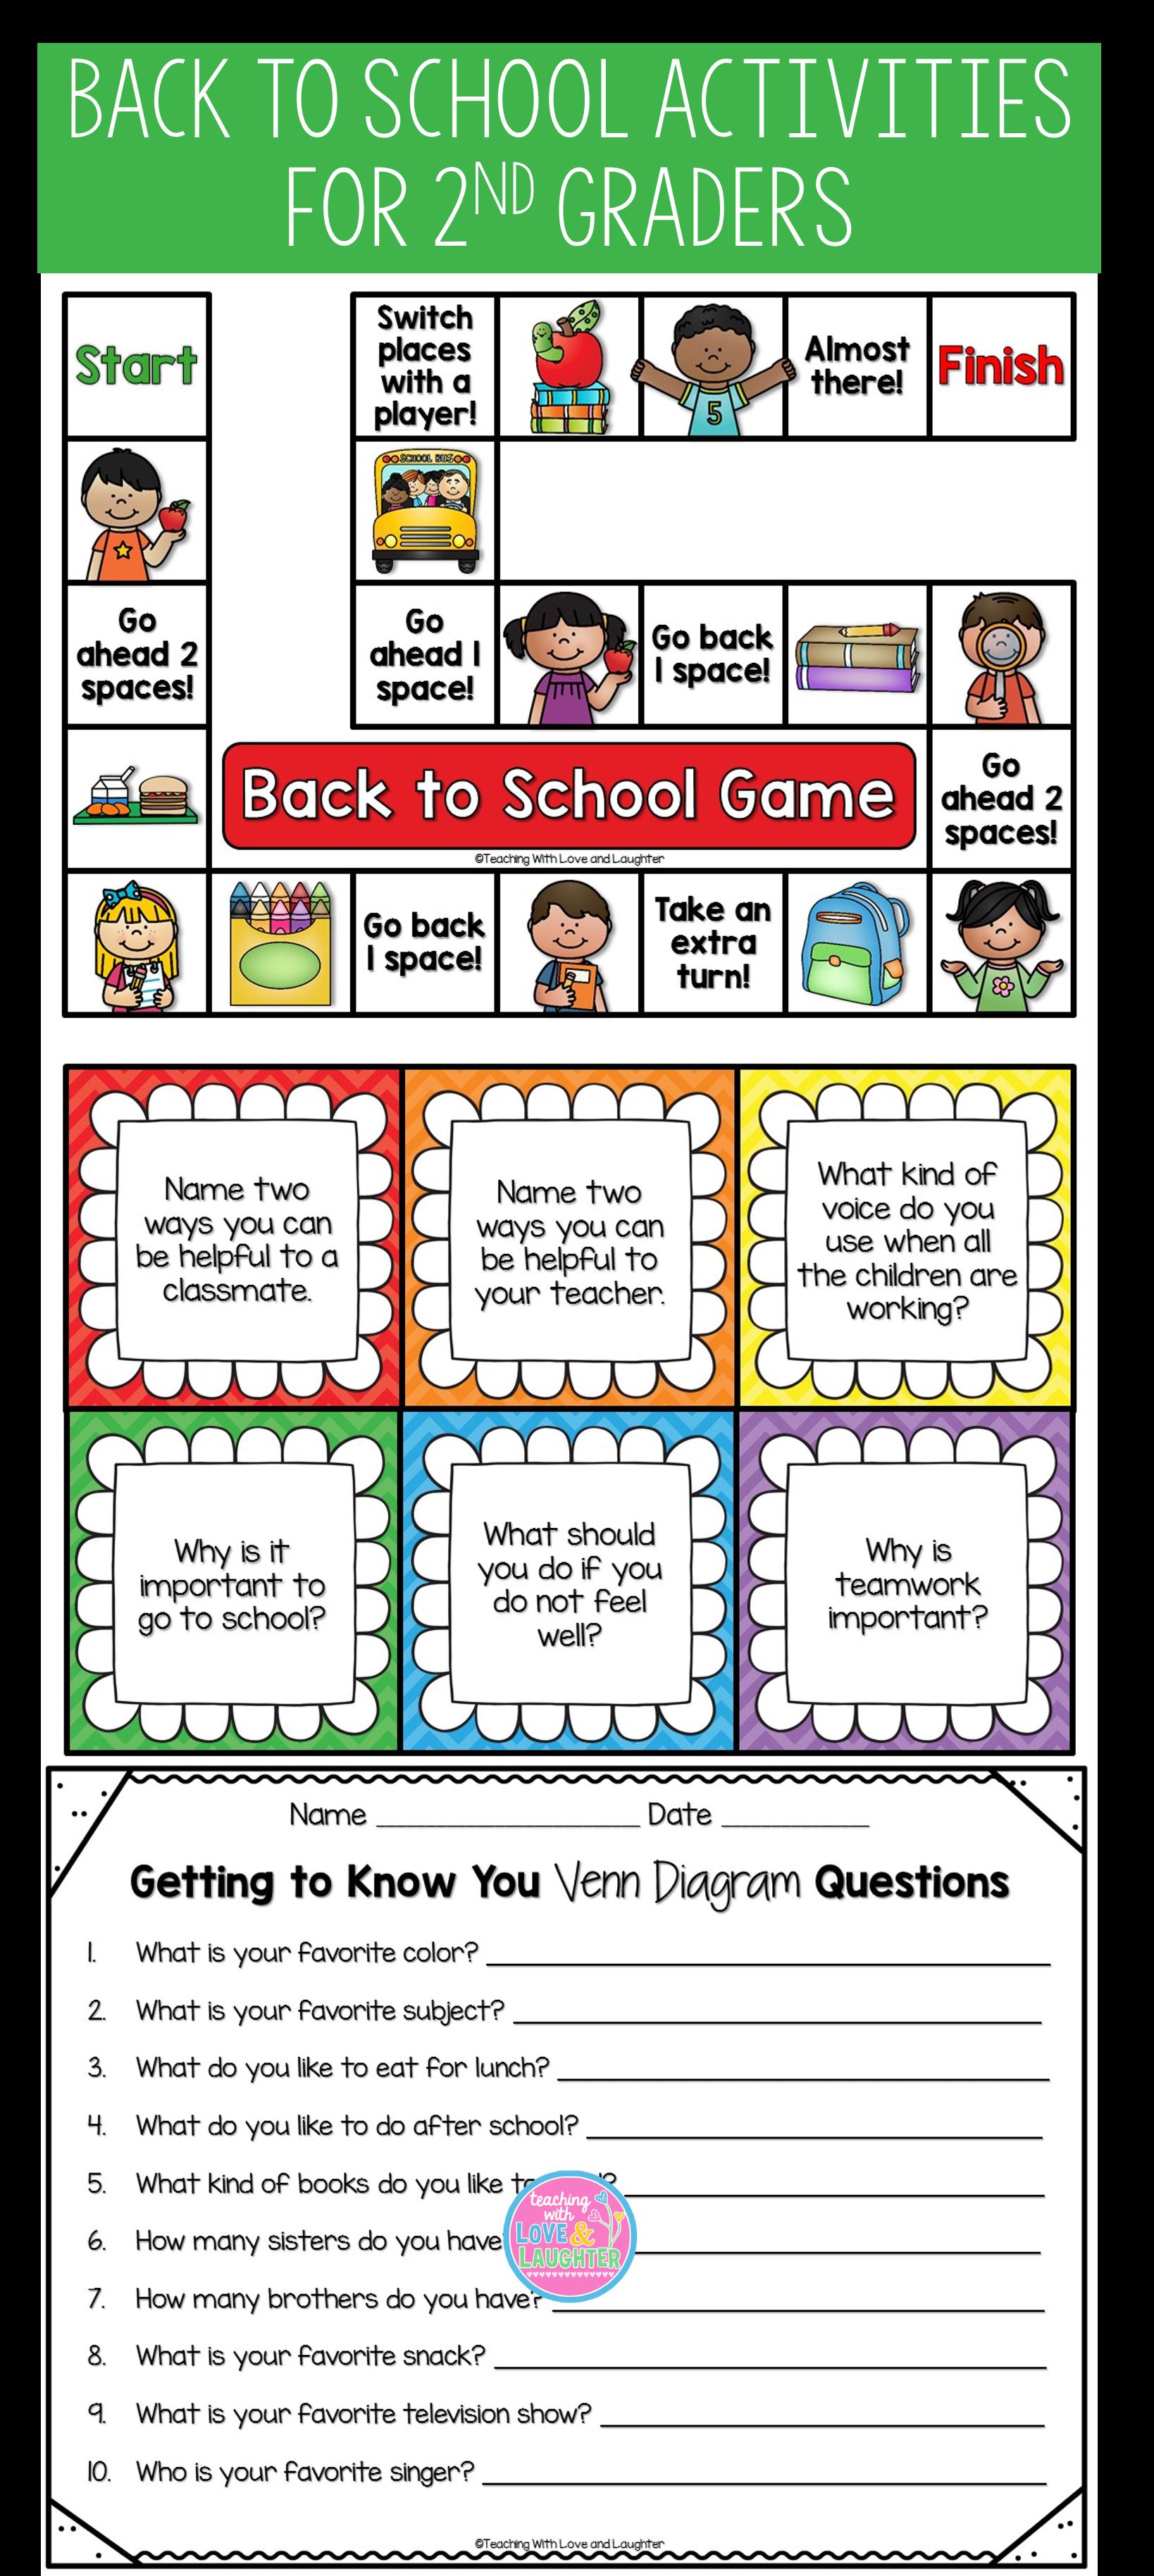 Back To School Activities For Second Graders